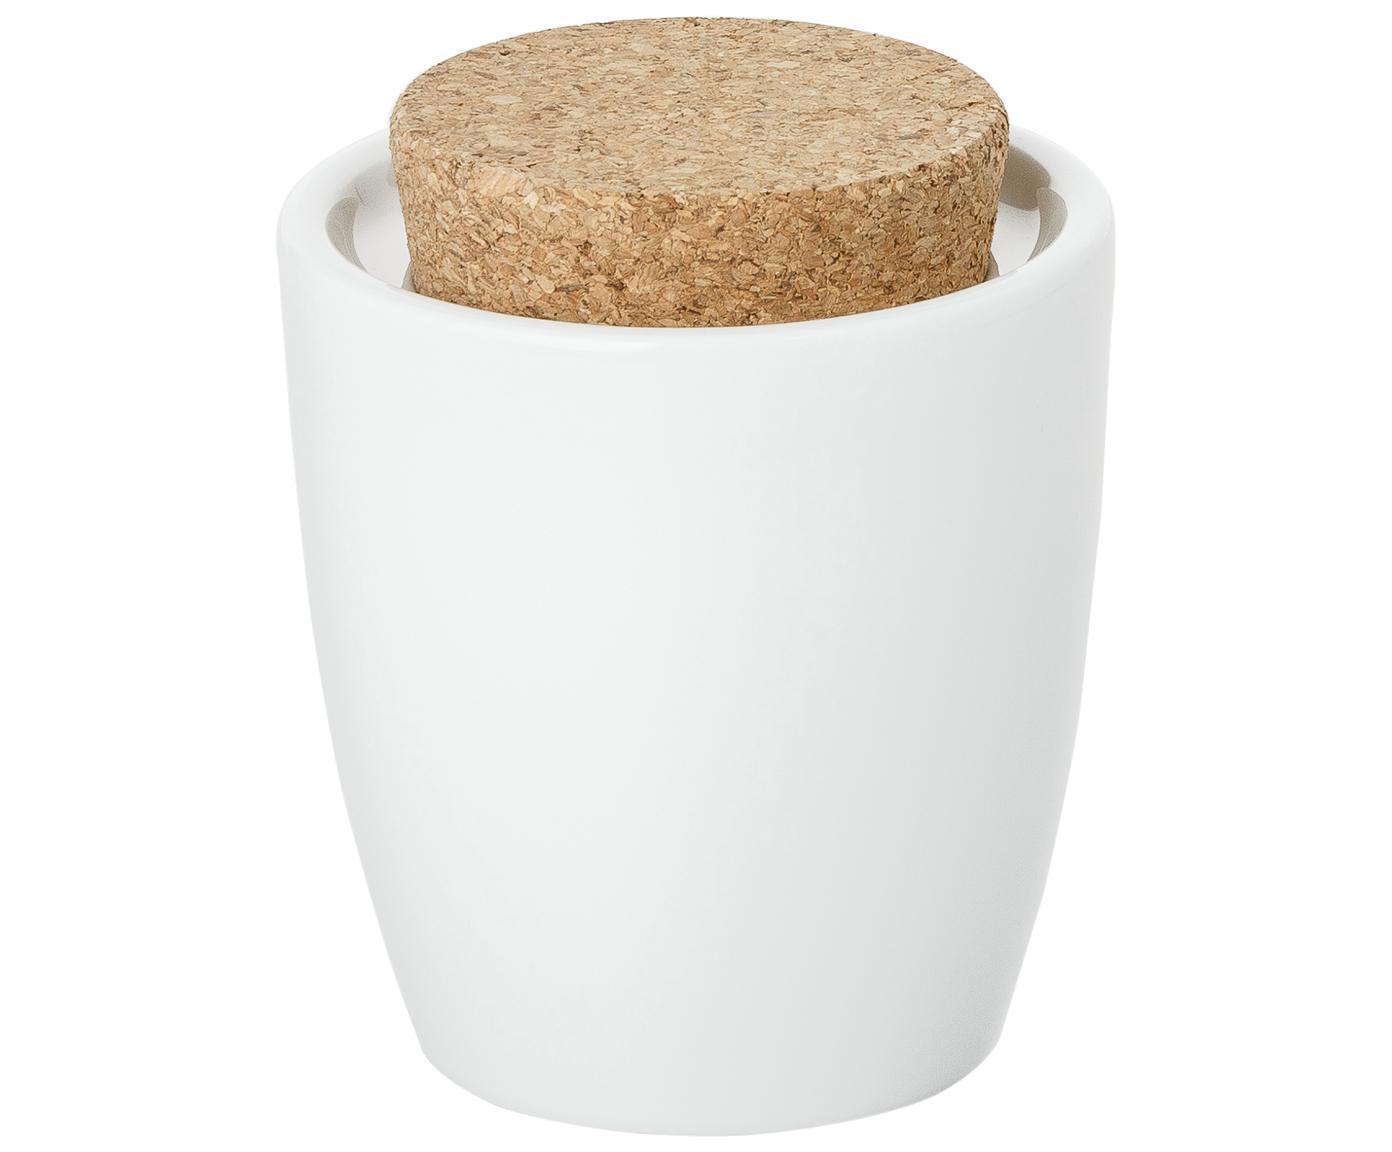 Azucarero Artesano Original, Porcelana, corcho, Blanco, 300 ml